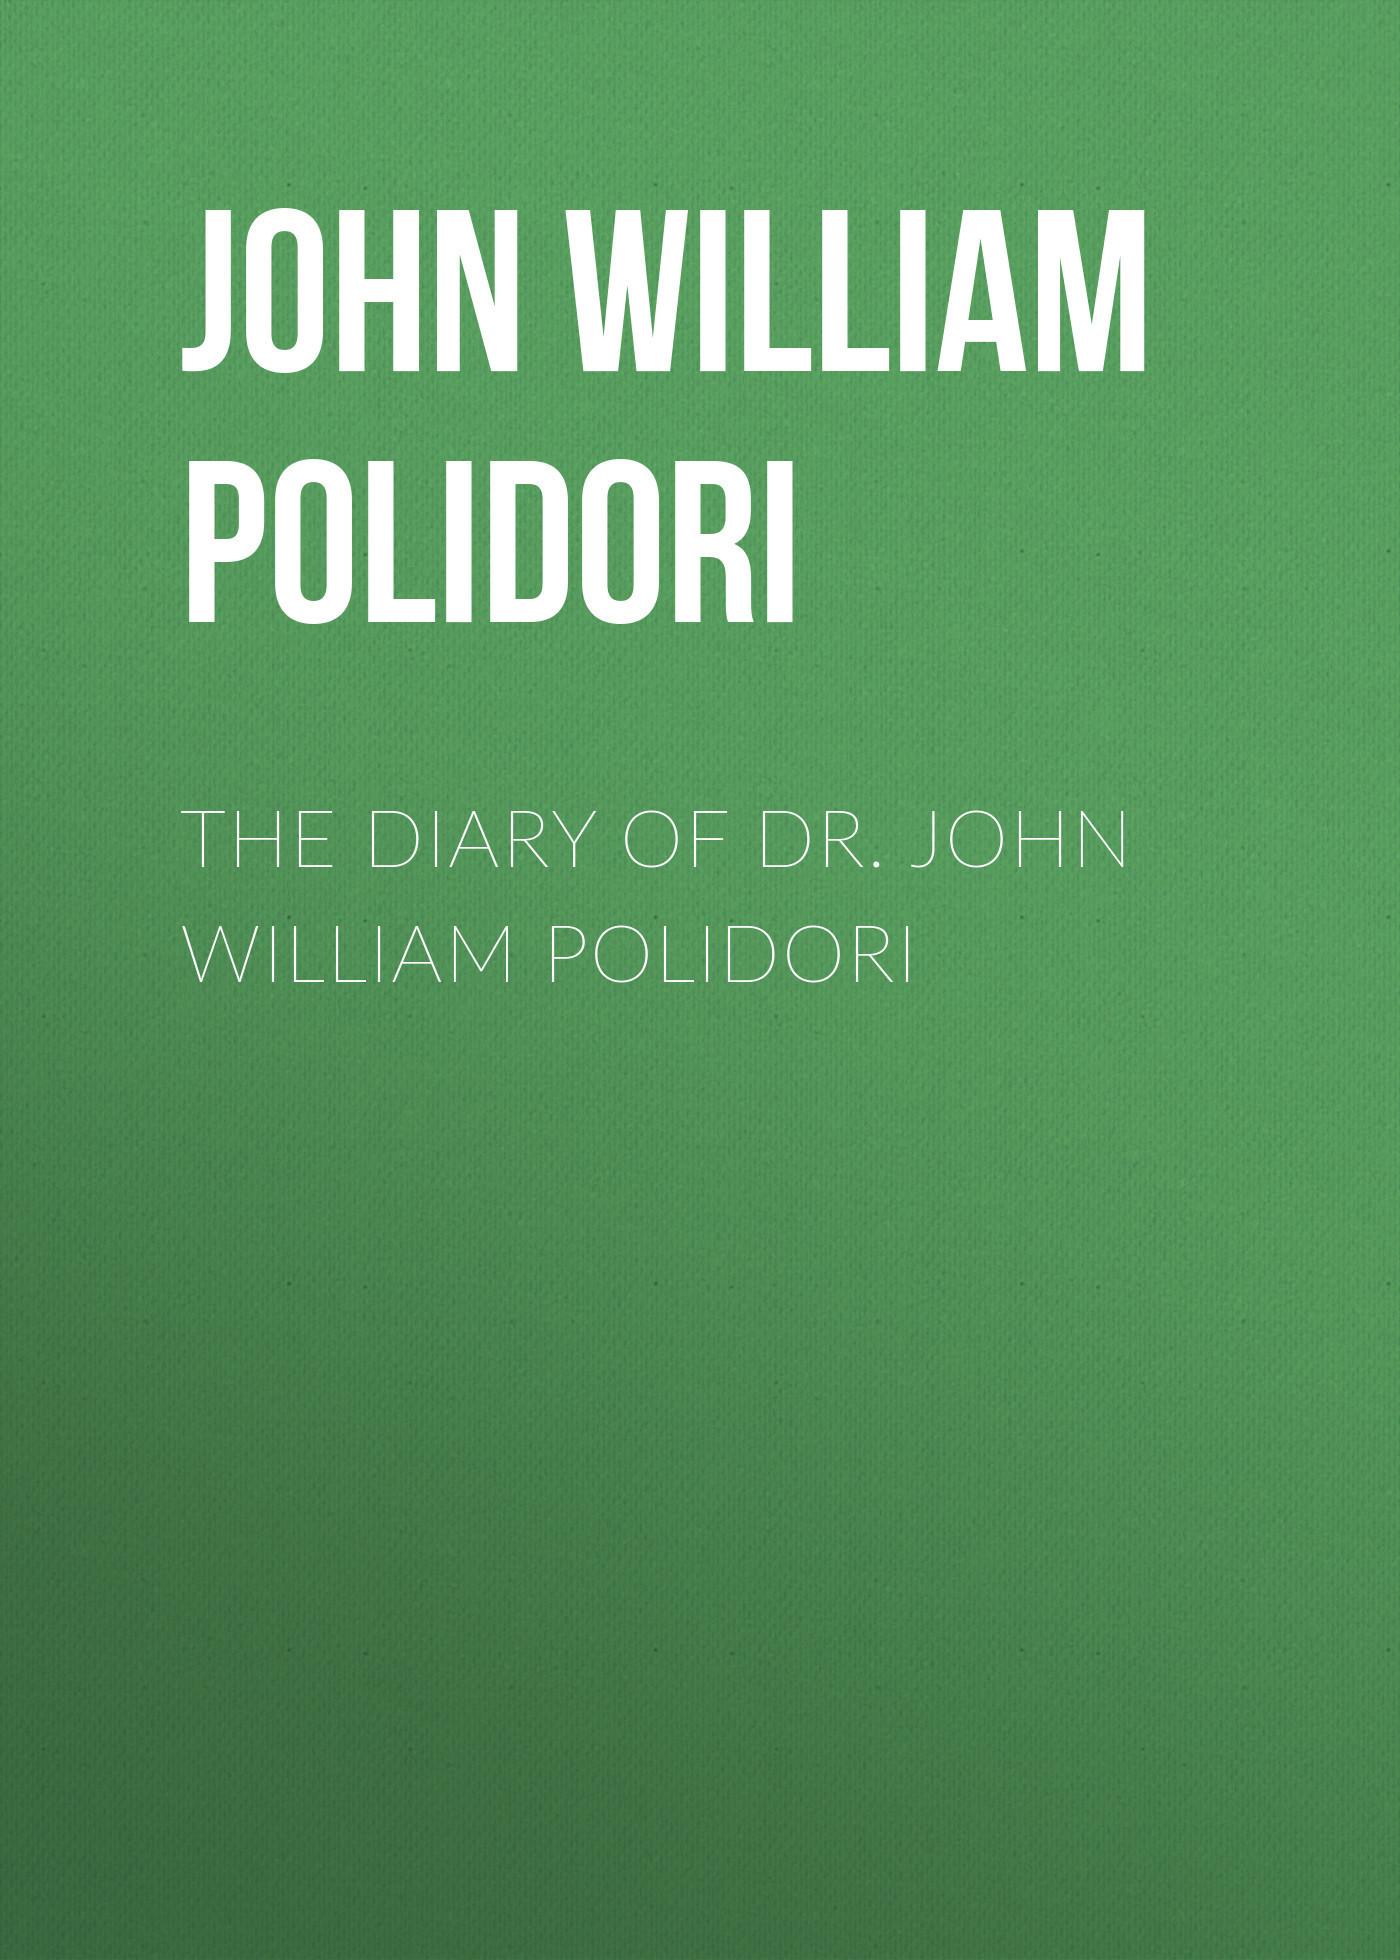 John William Polidori The Diary of Dr. John William Polidori william l wlac03bcorcm